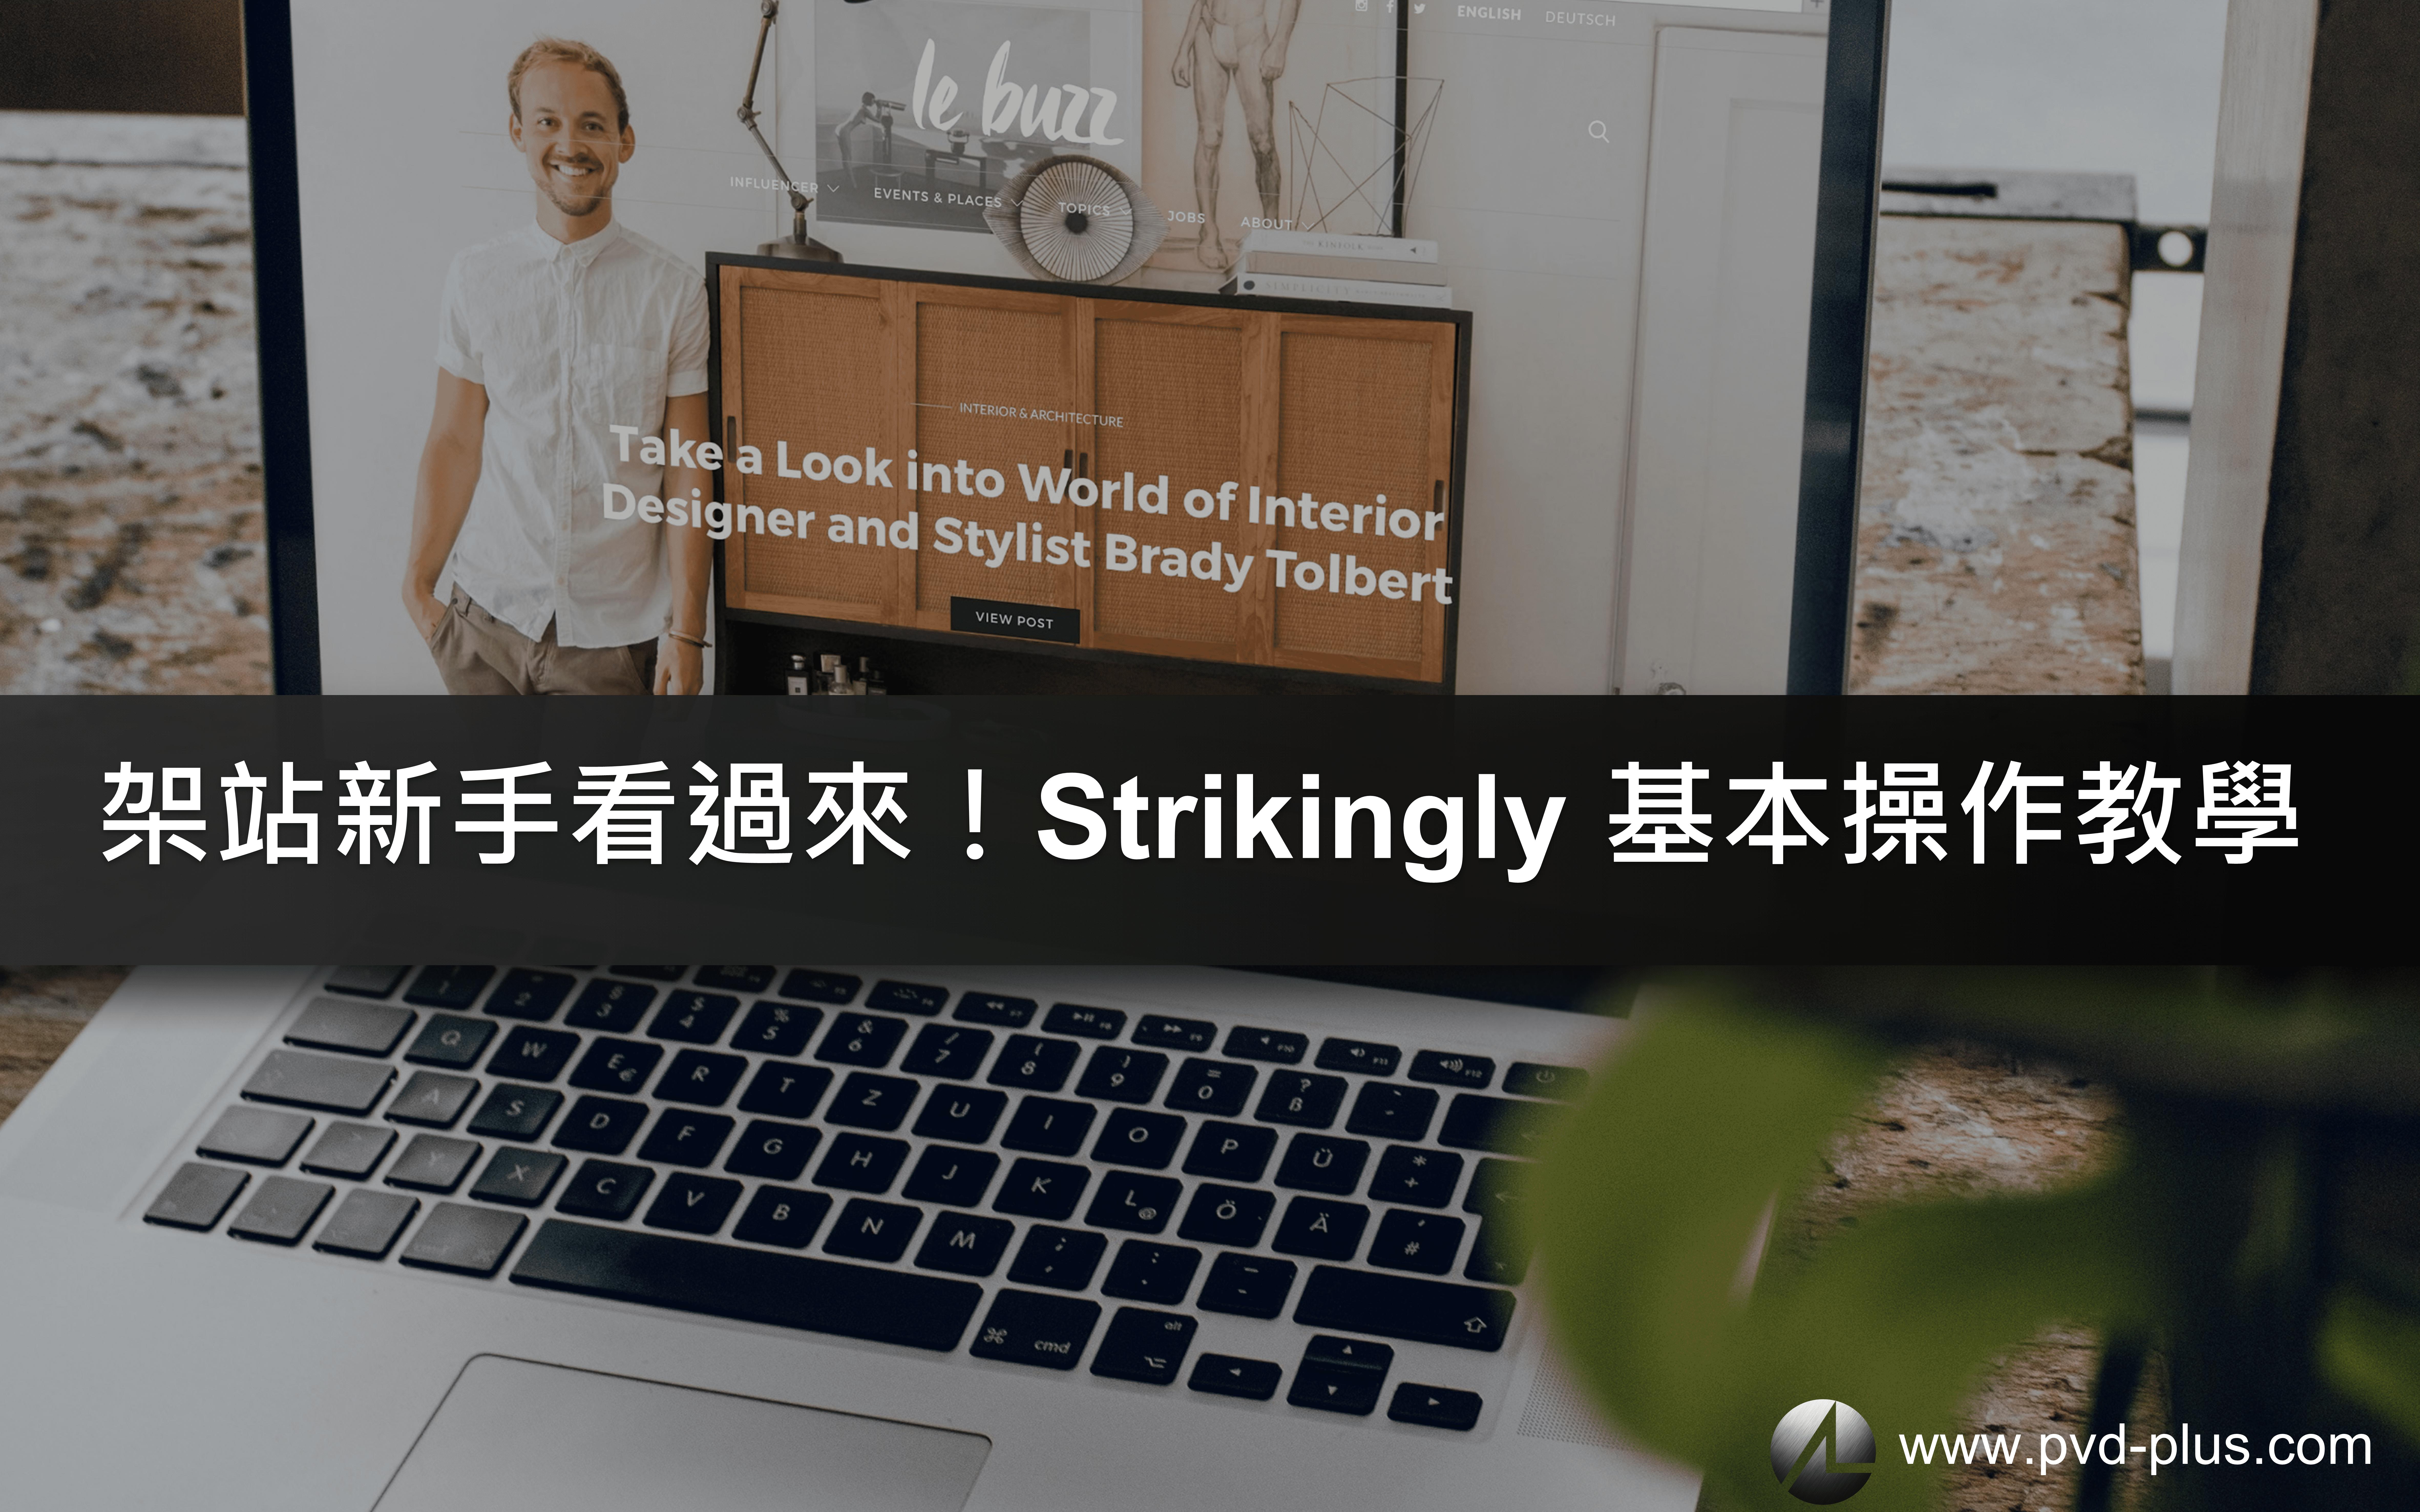 Strikingly 網站教學   盤點 3 個架設網站必須知道的基本操作